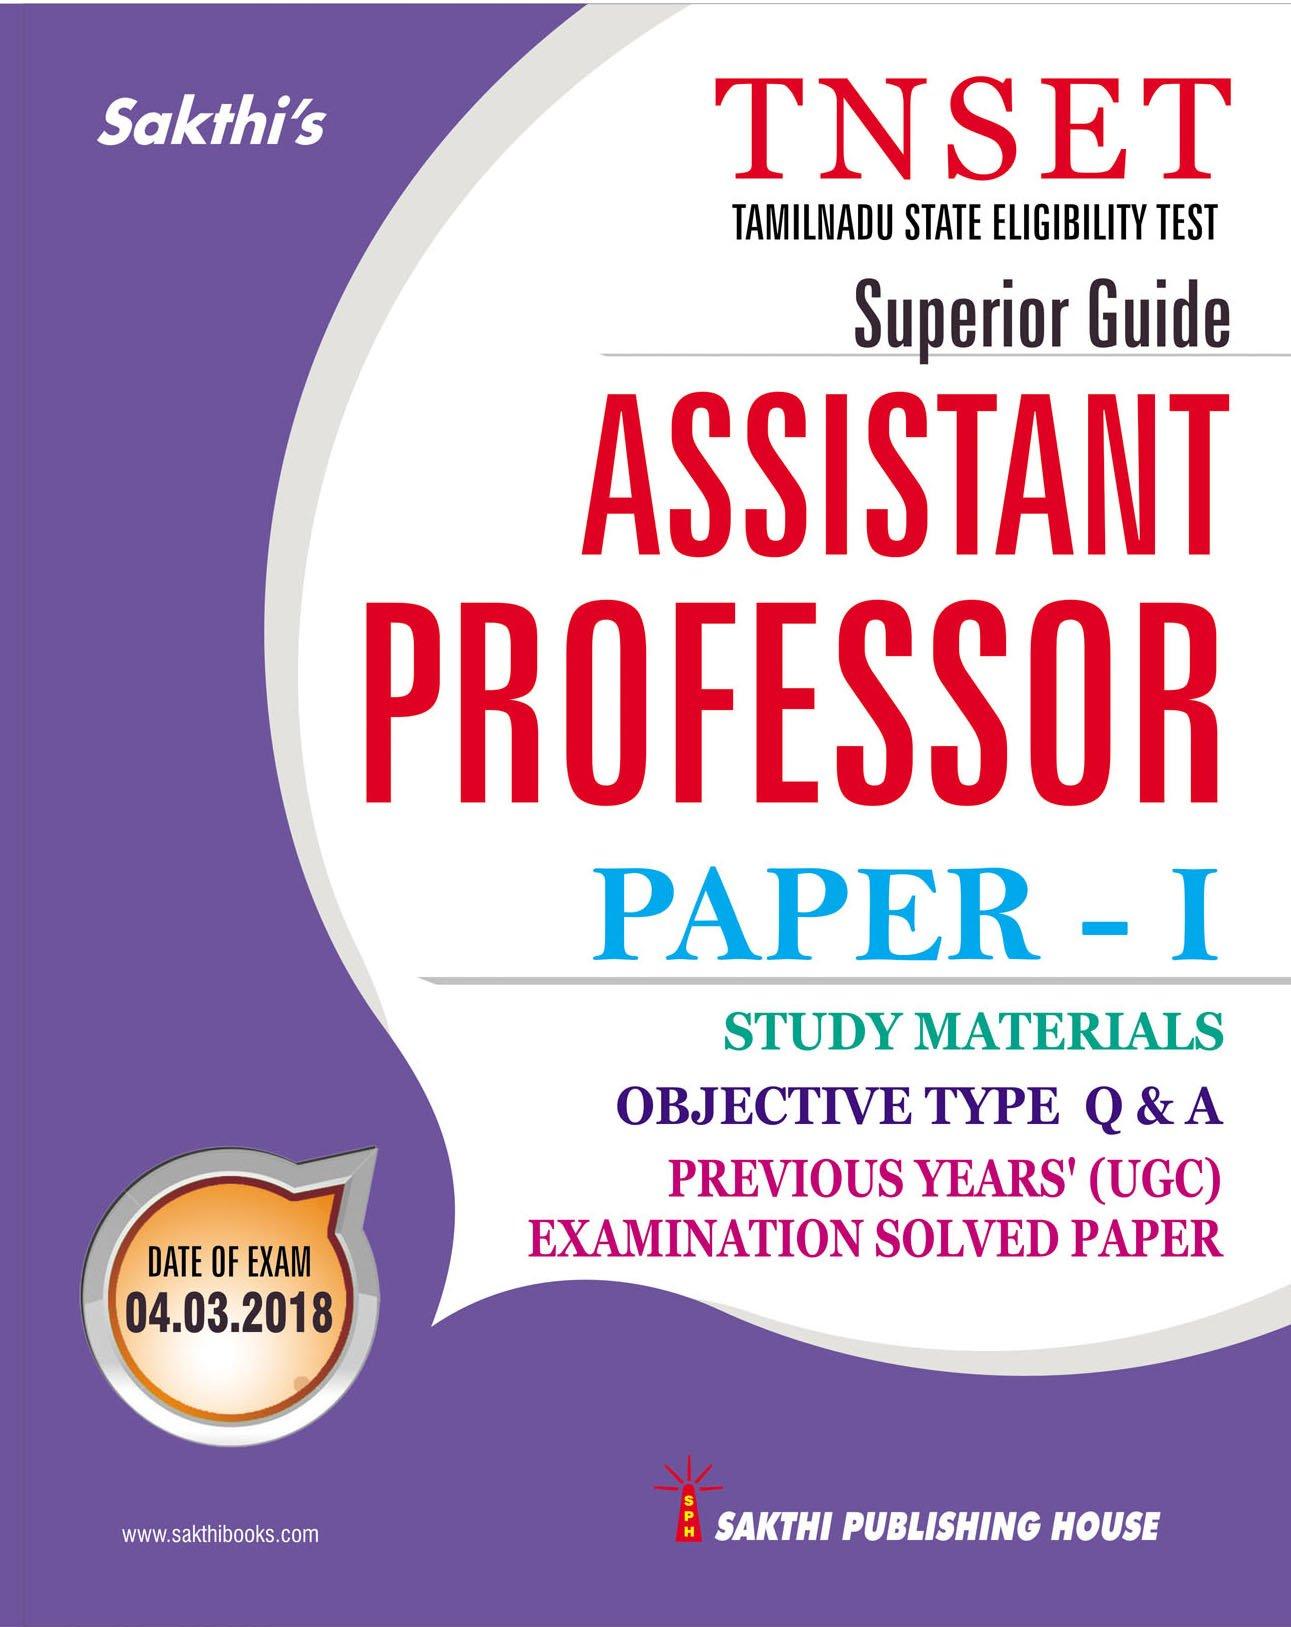 Amazon in: Buy Tnset - Assistant Professor Paper - I Study